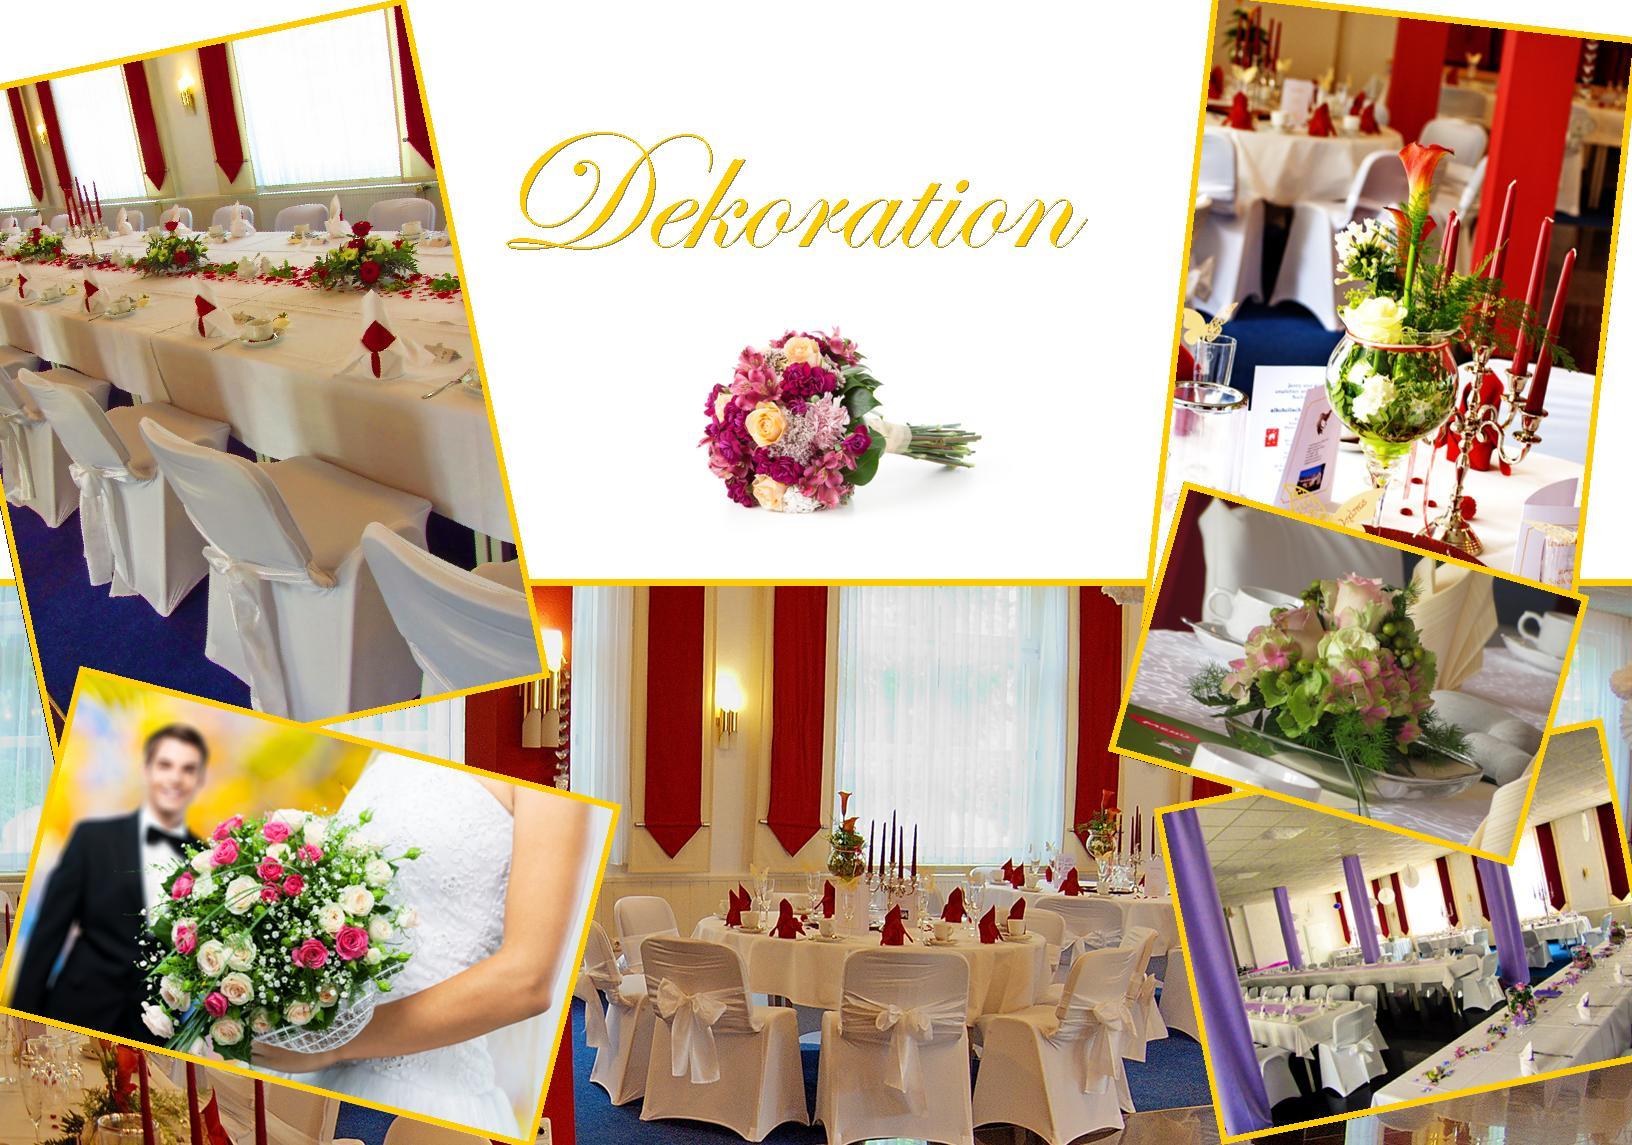 dekoration2